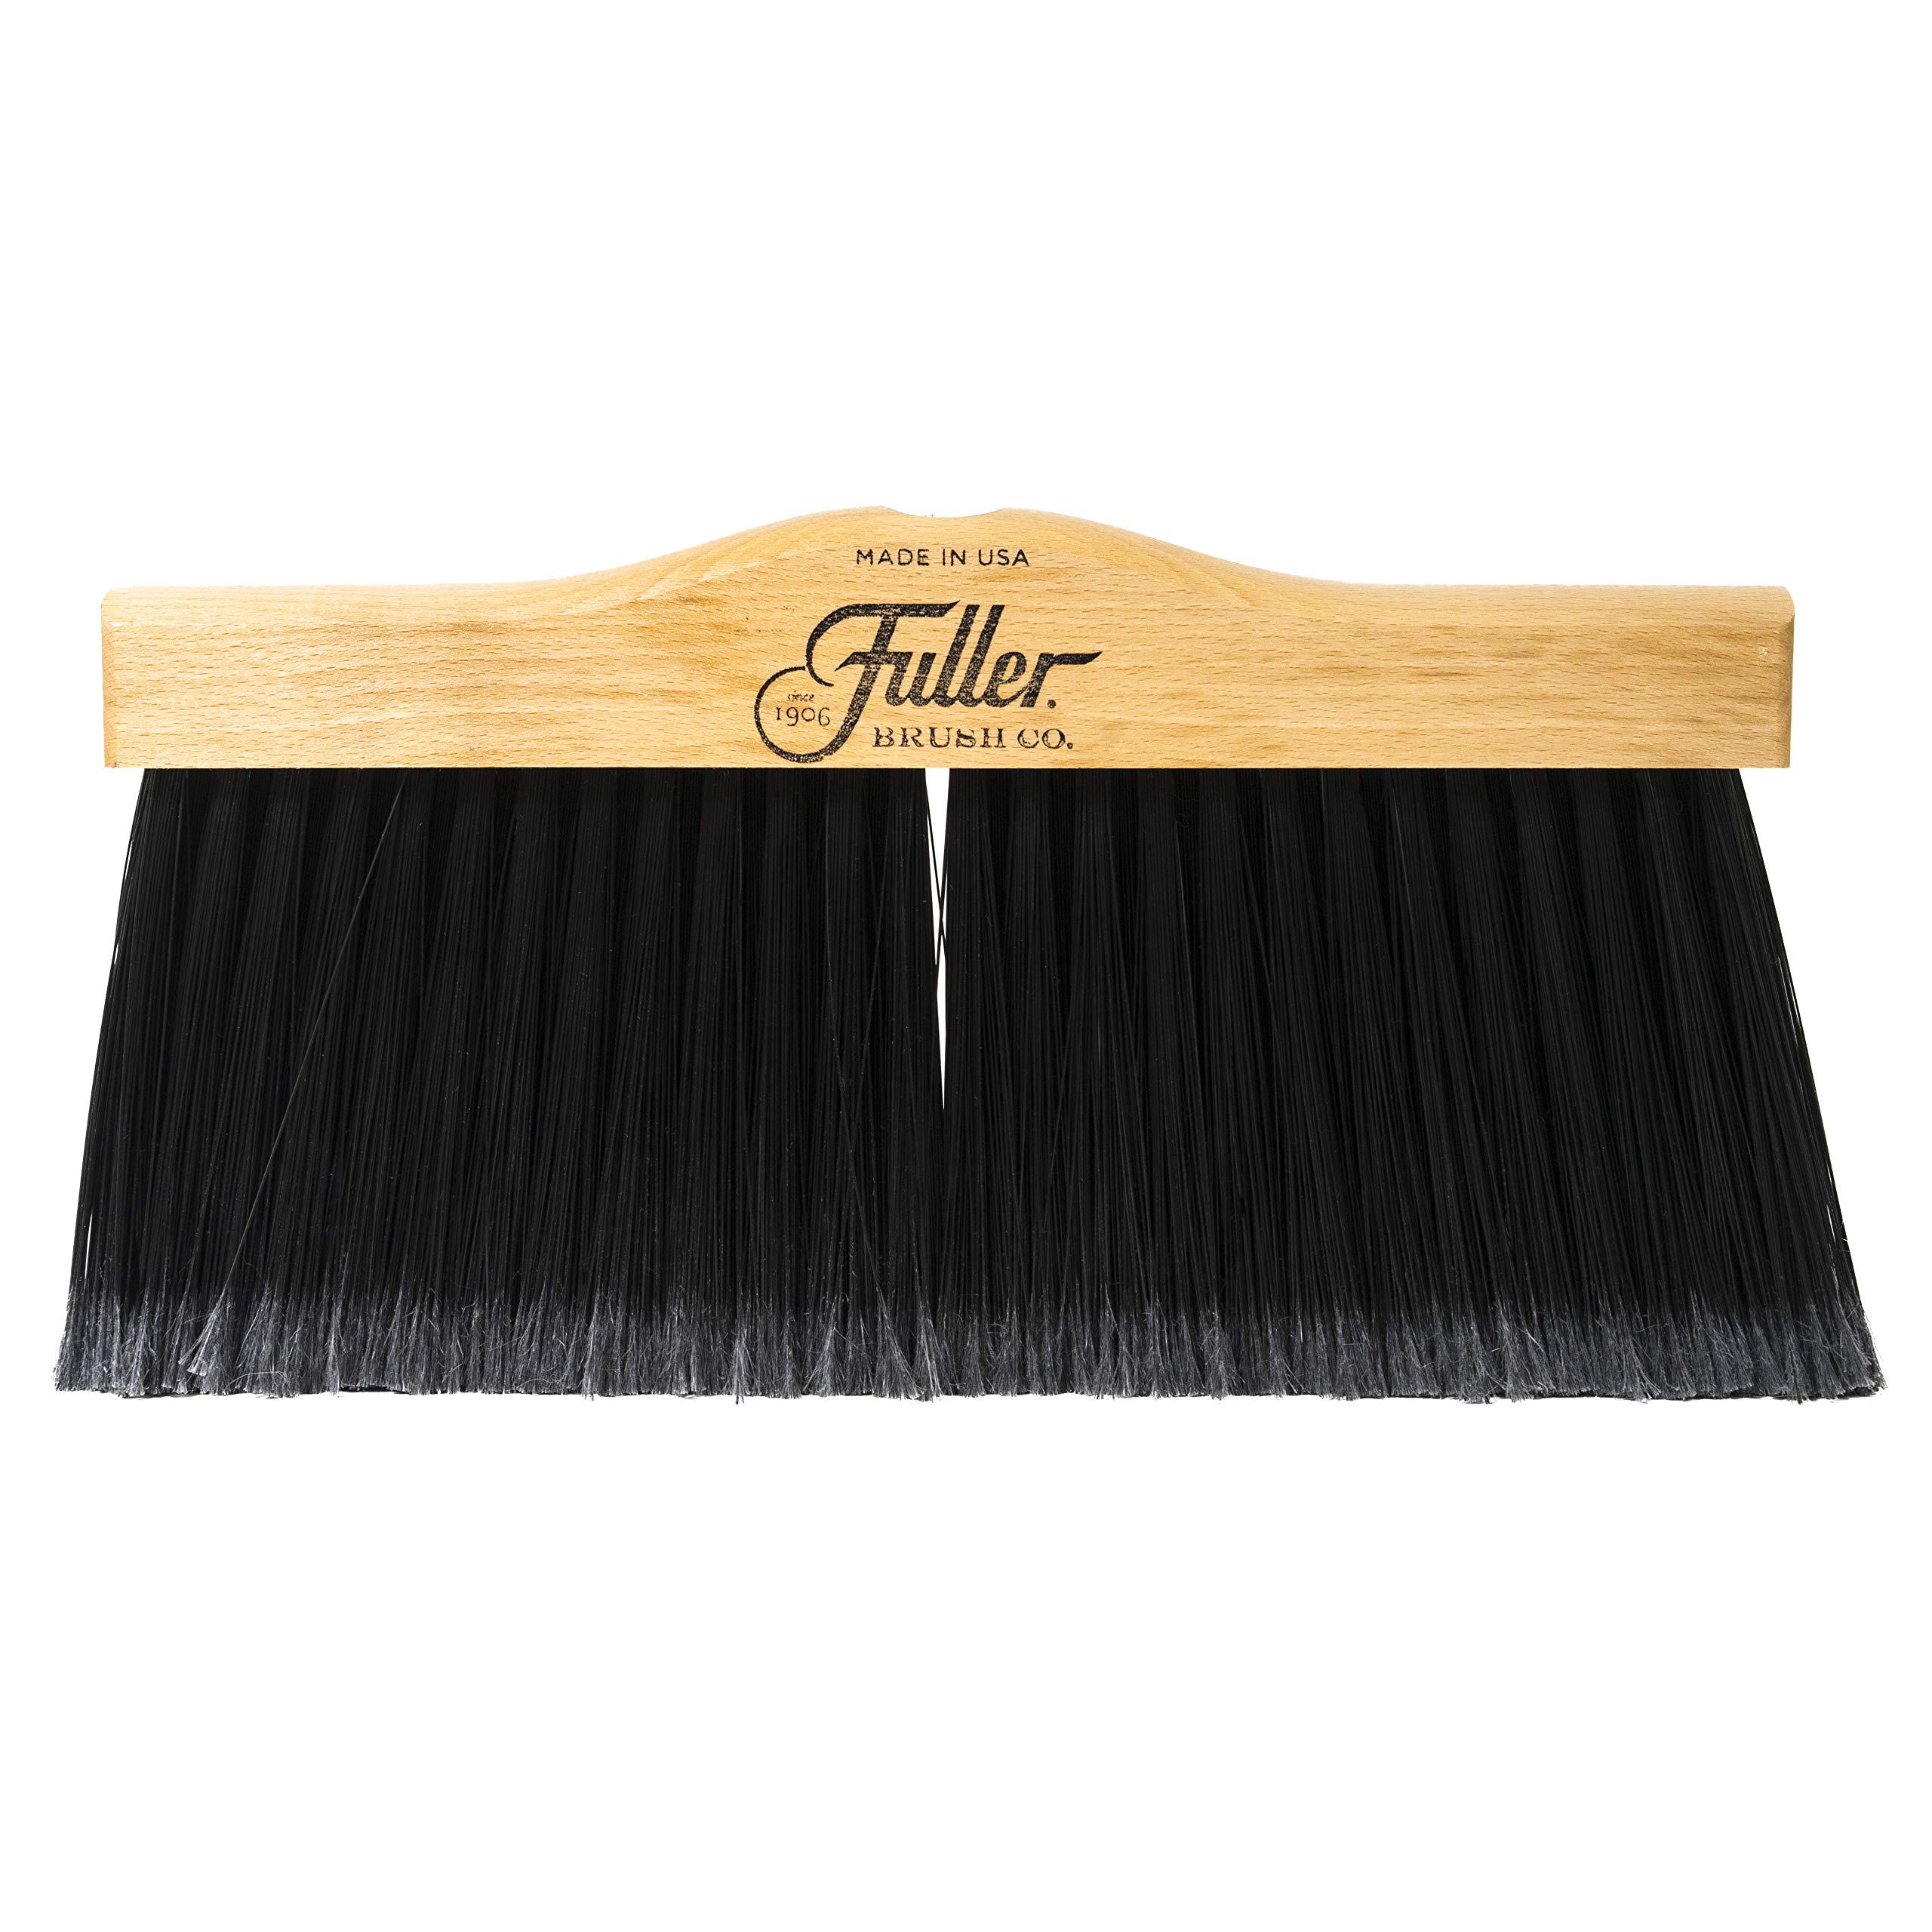 Fuller Brush Indoor/Outdoor Broom Head - Heavy Duty Wide Wooden Sweeper w/Long Bristles - Commercial Floor Brush for Salon, Shop, Kitchen & Garage - 12-inch Wide by Fuller Brush